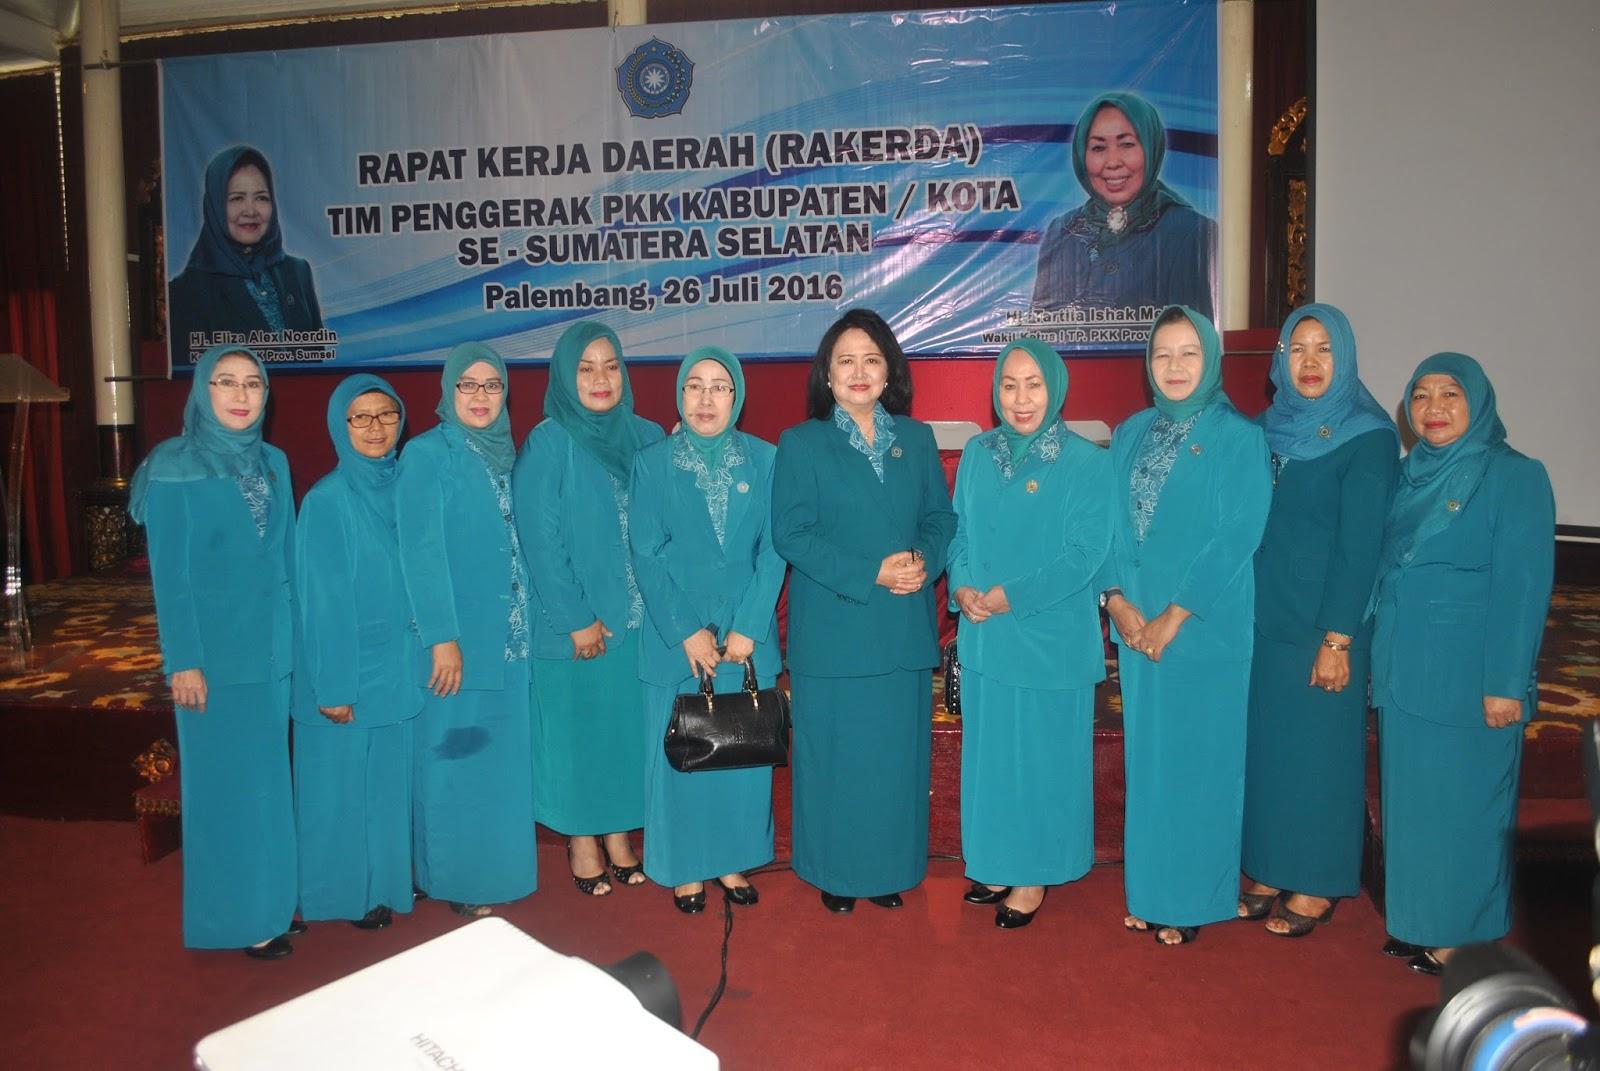 Rapat Kerja Daerah Rakerdah Tim Penggerak Pkk Kabupatenkota Se Sumatera Selatan Tanggal